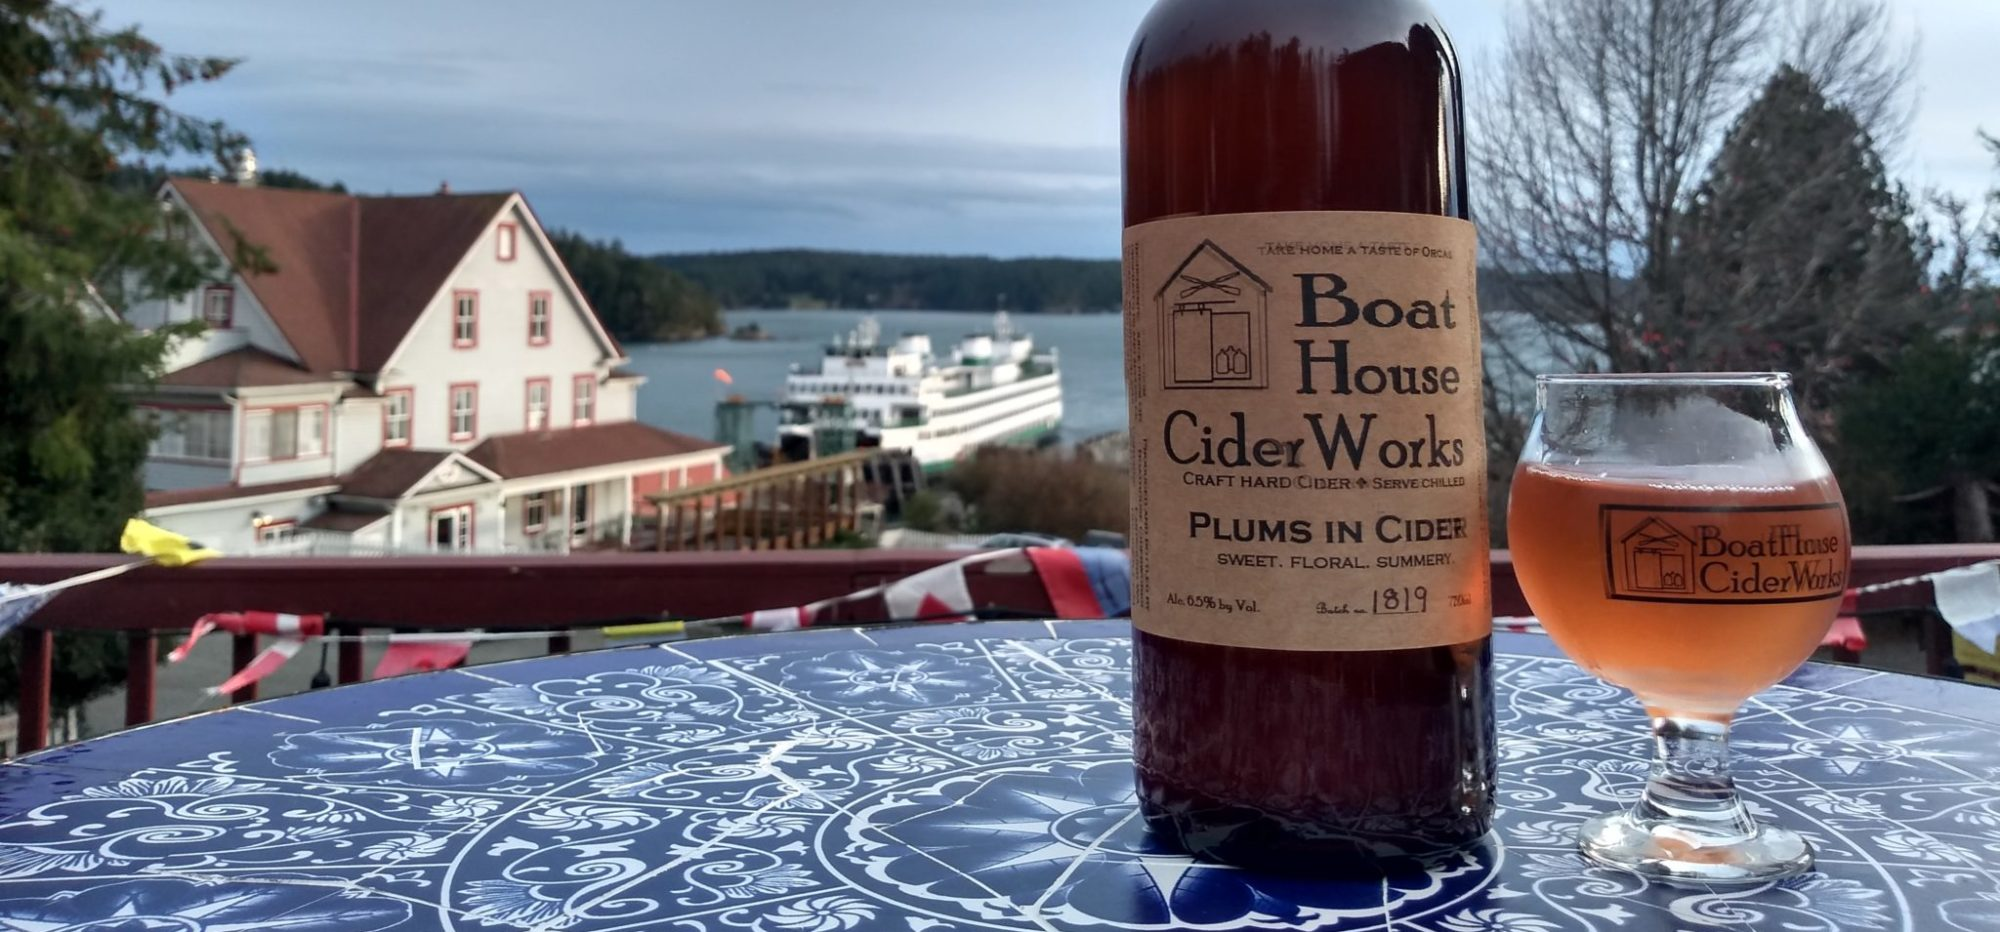 Boathouse CiderWorks